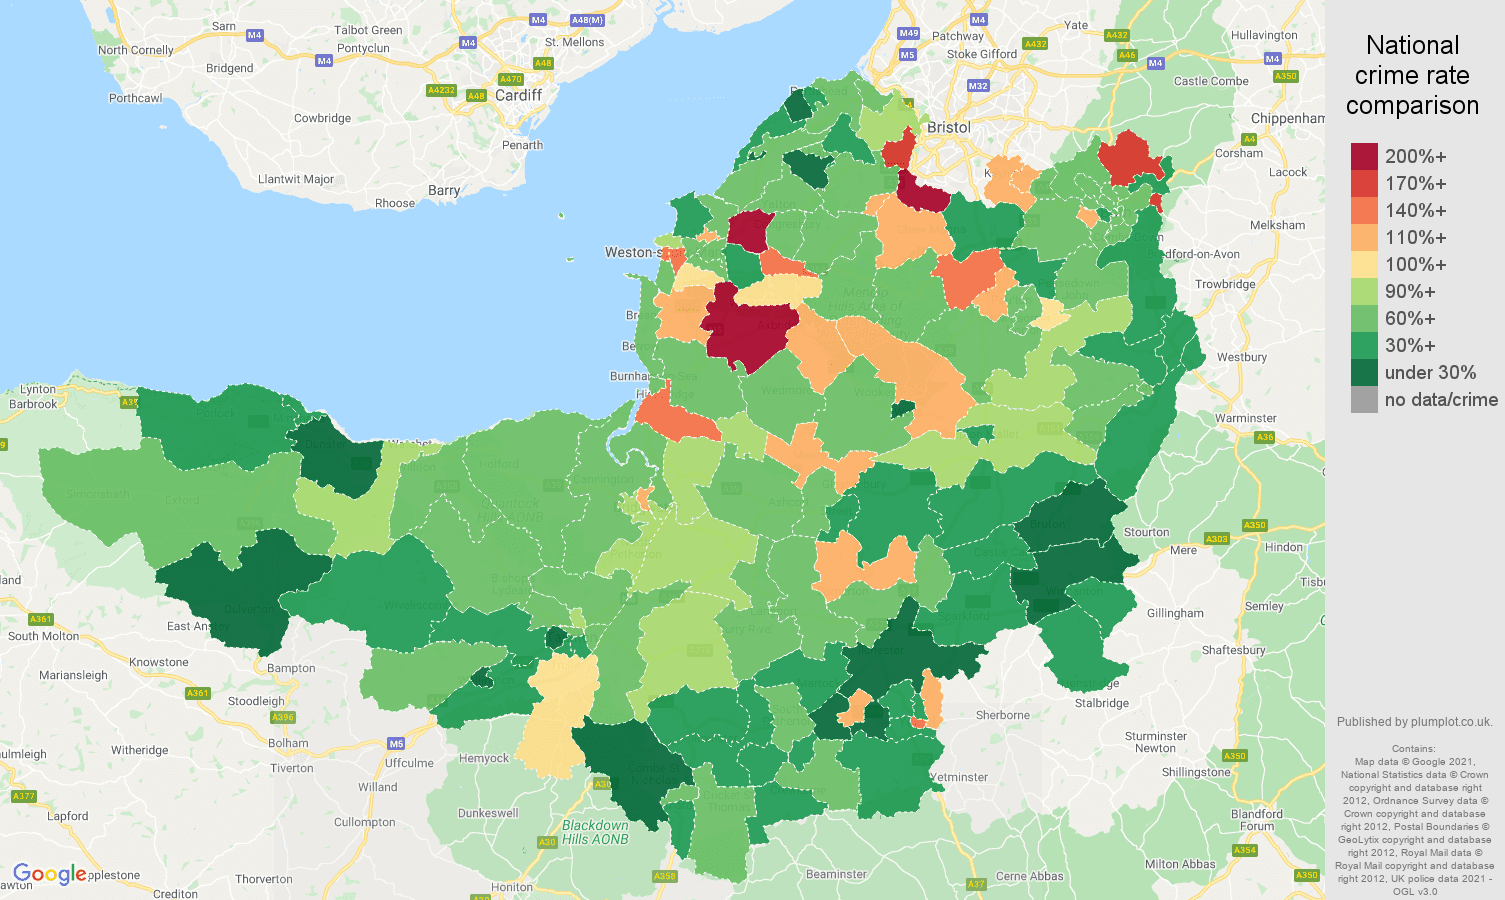 Somerset burglary crime rate comparison map